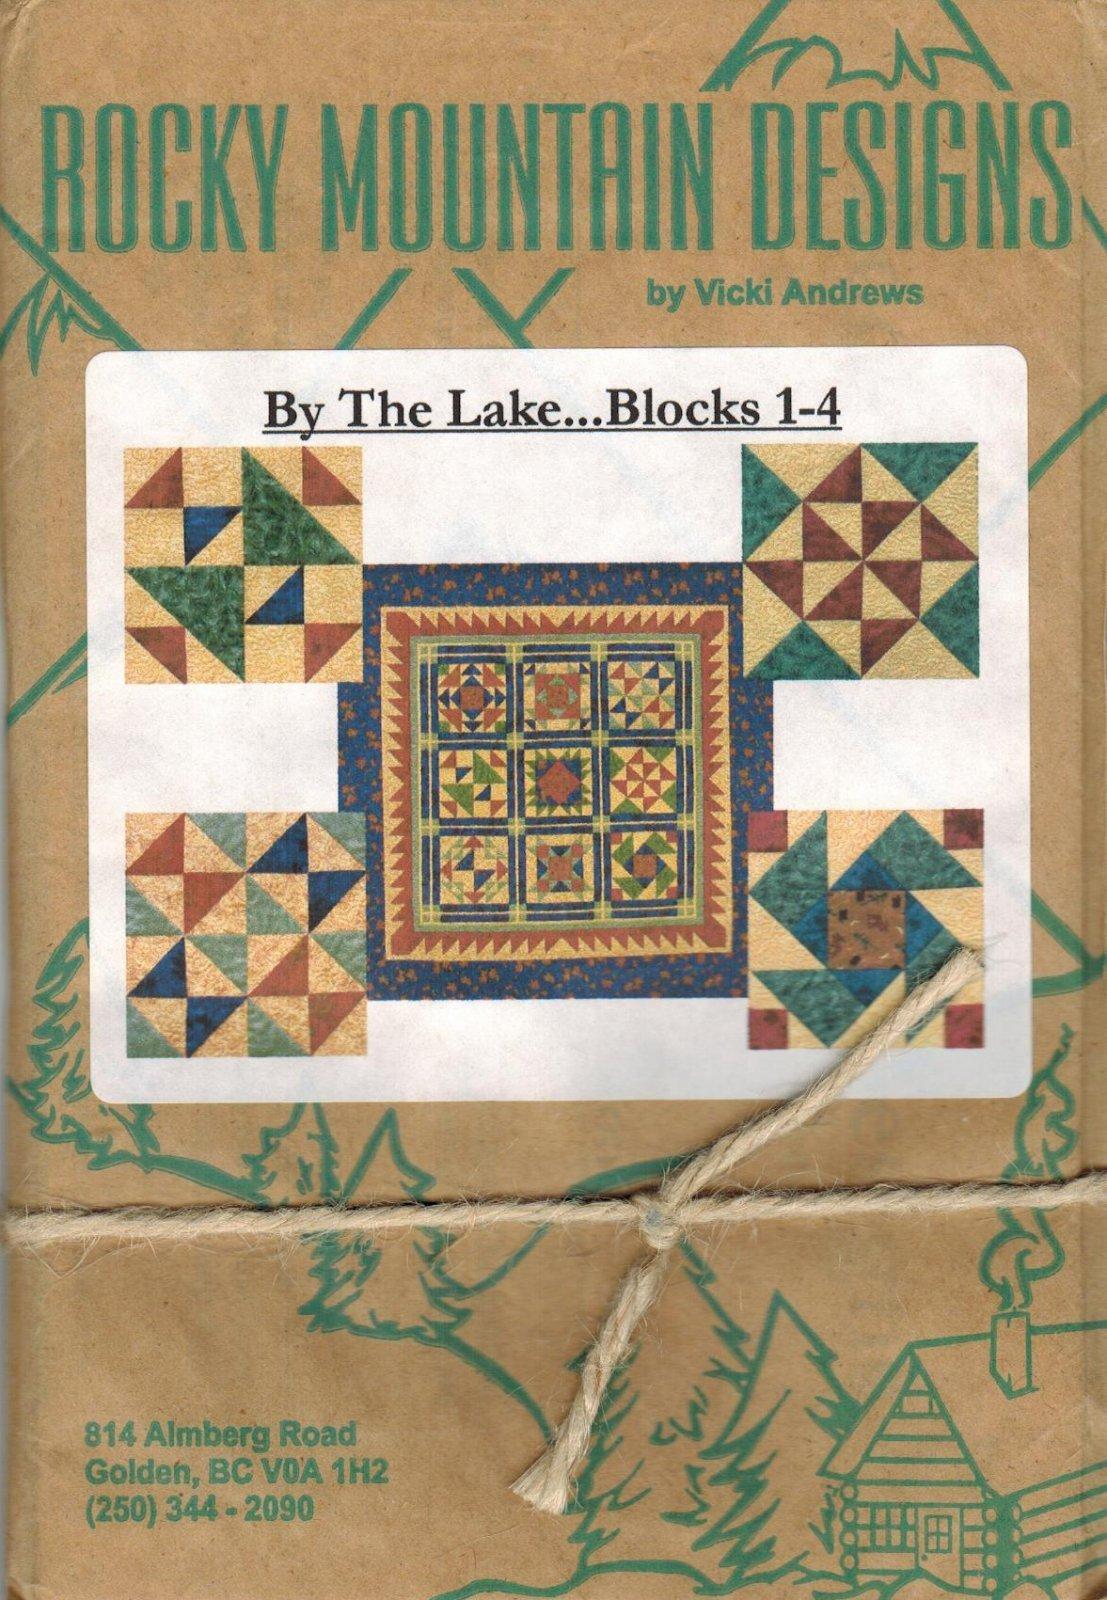 By The Lake....Blocks 1-4